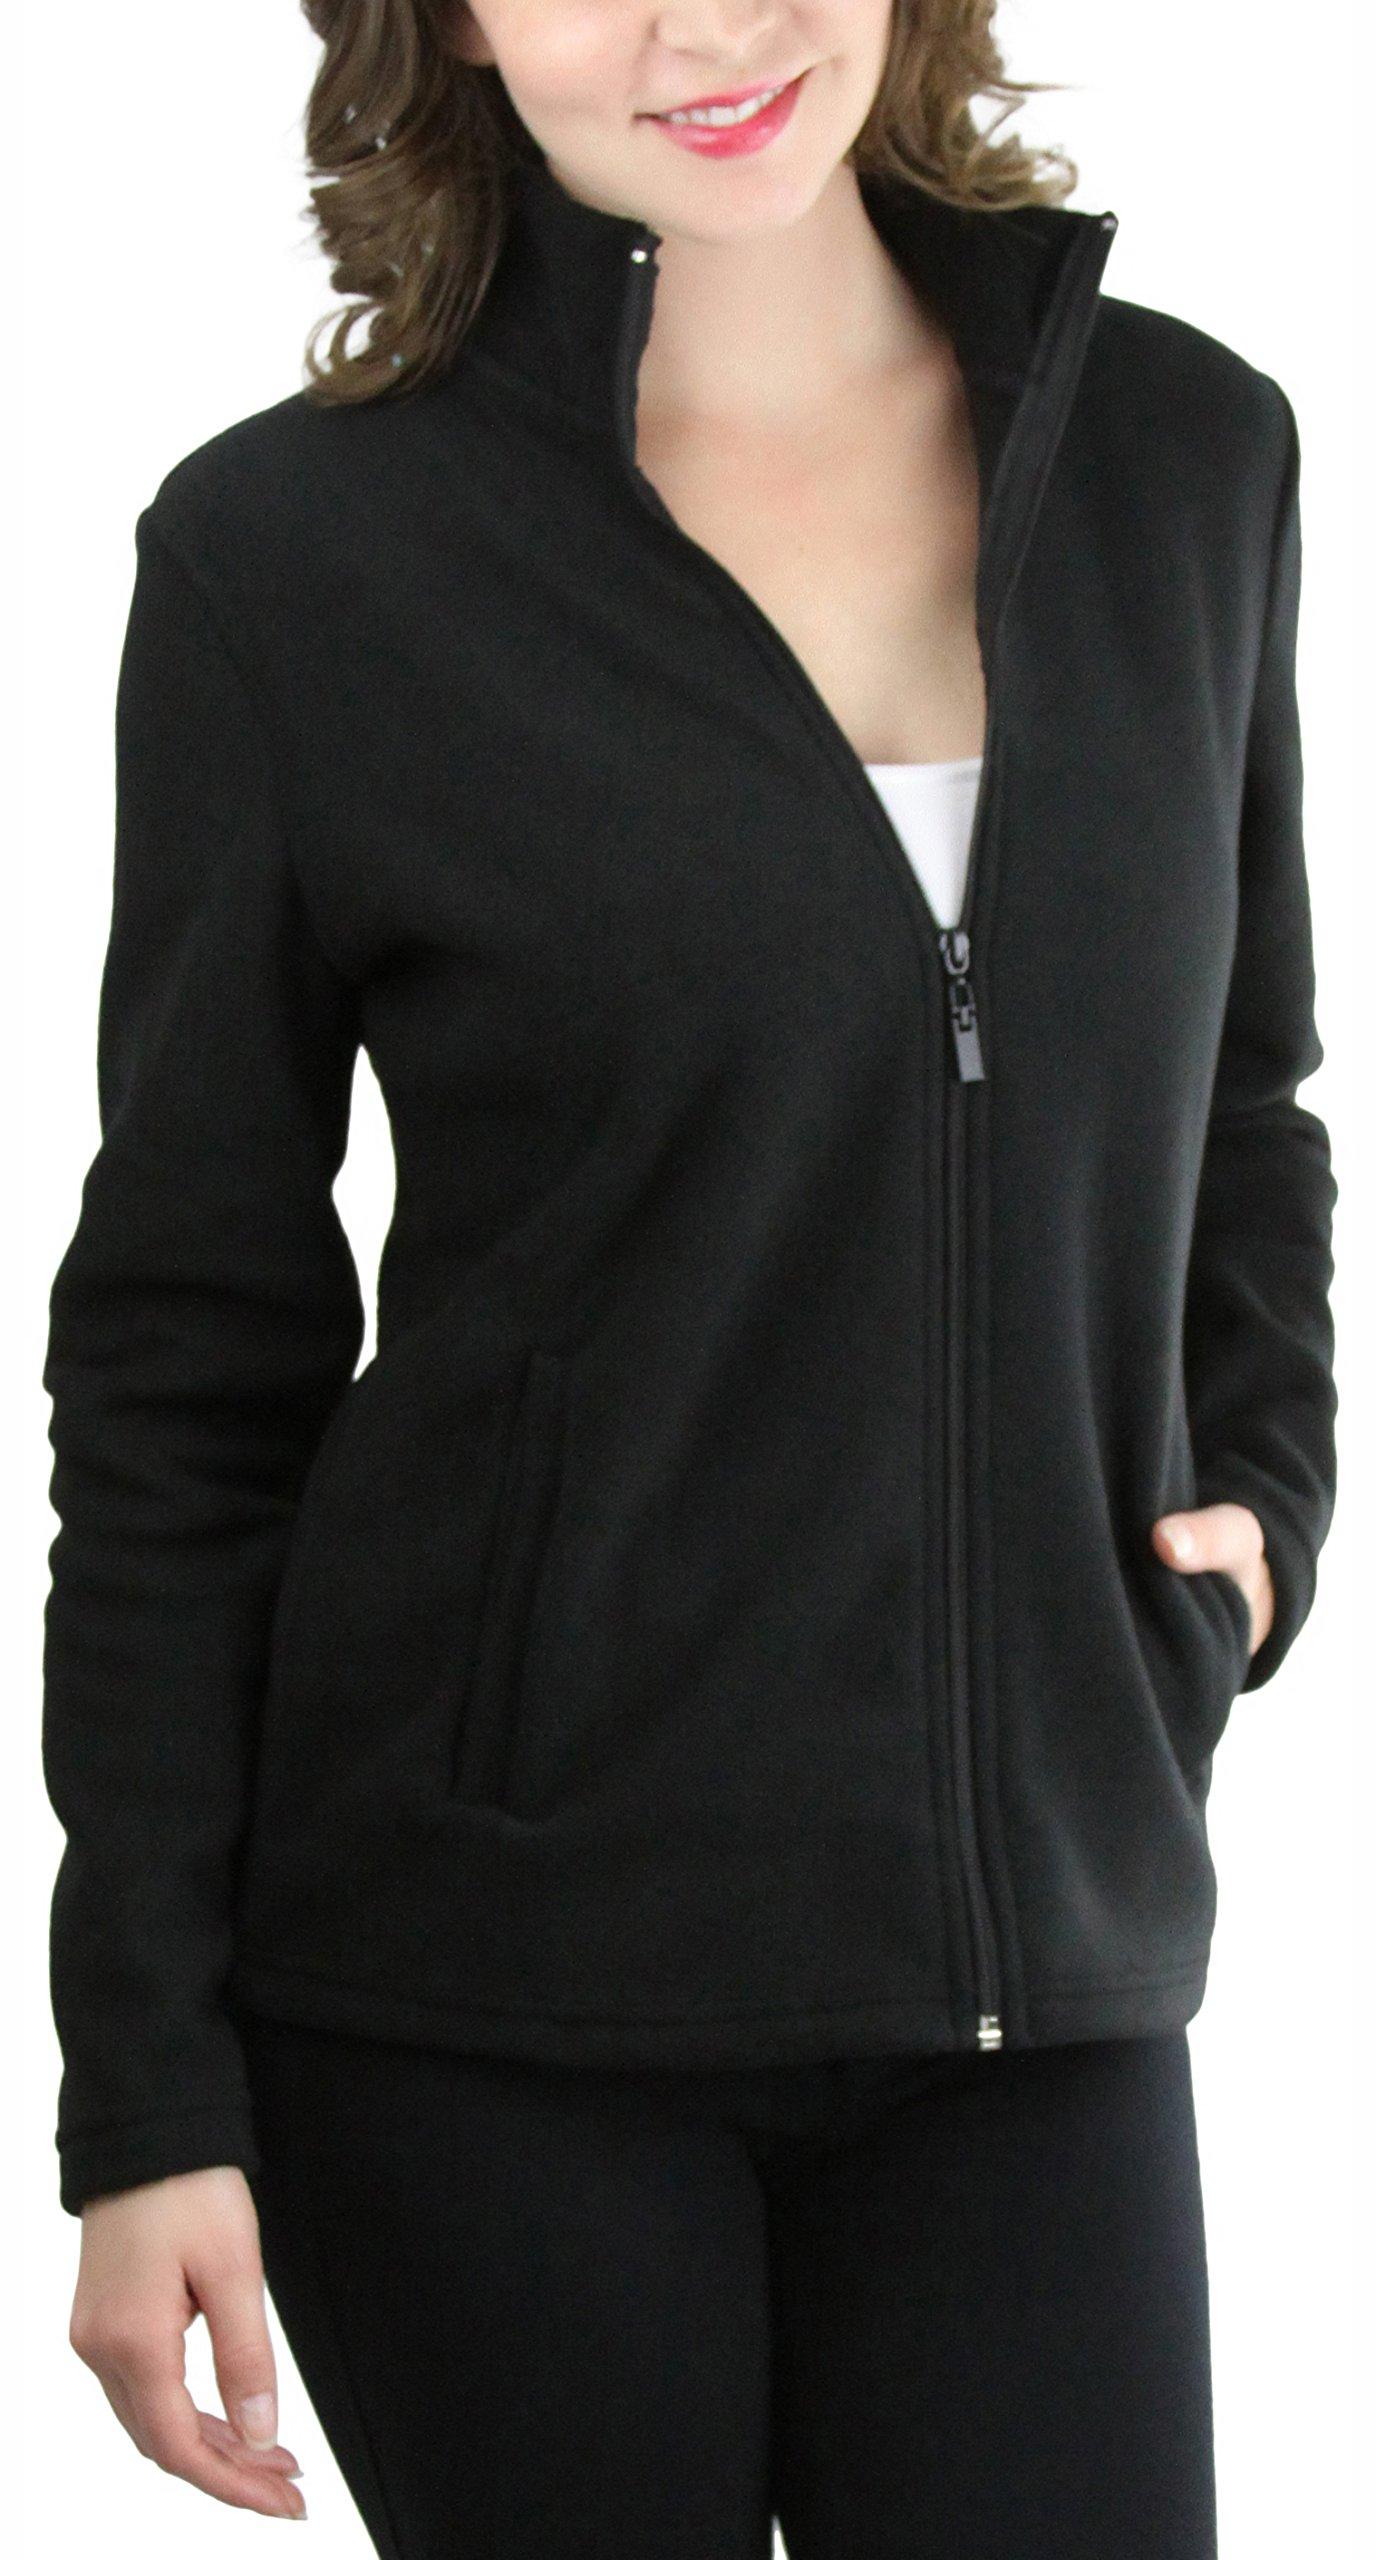 ToBeInStyle Women's Zip High Collar Polar Fleece L.S. Jacket - Black - Large